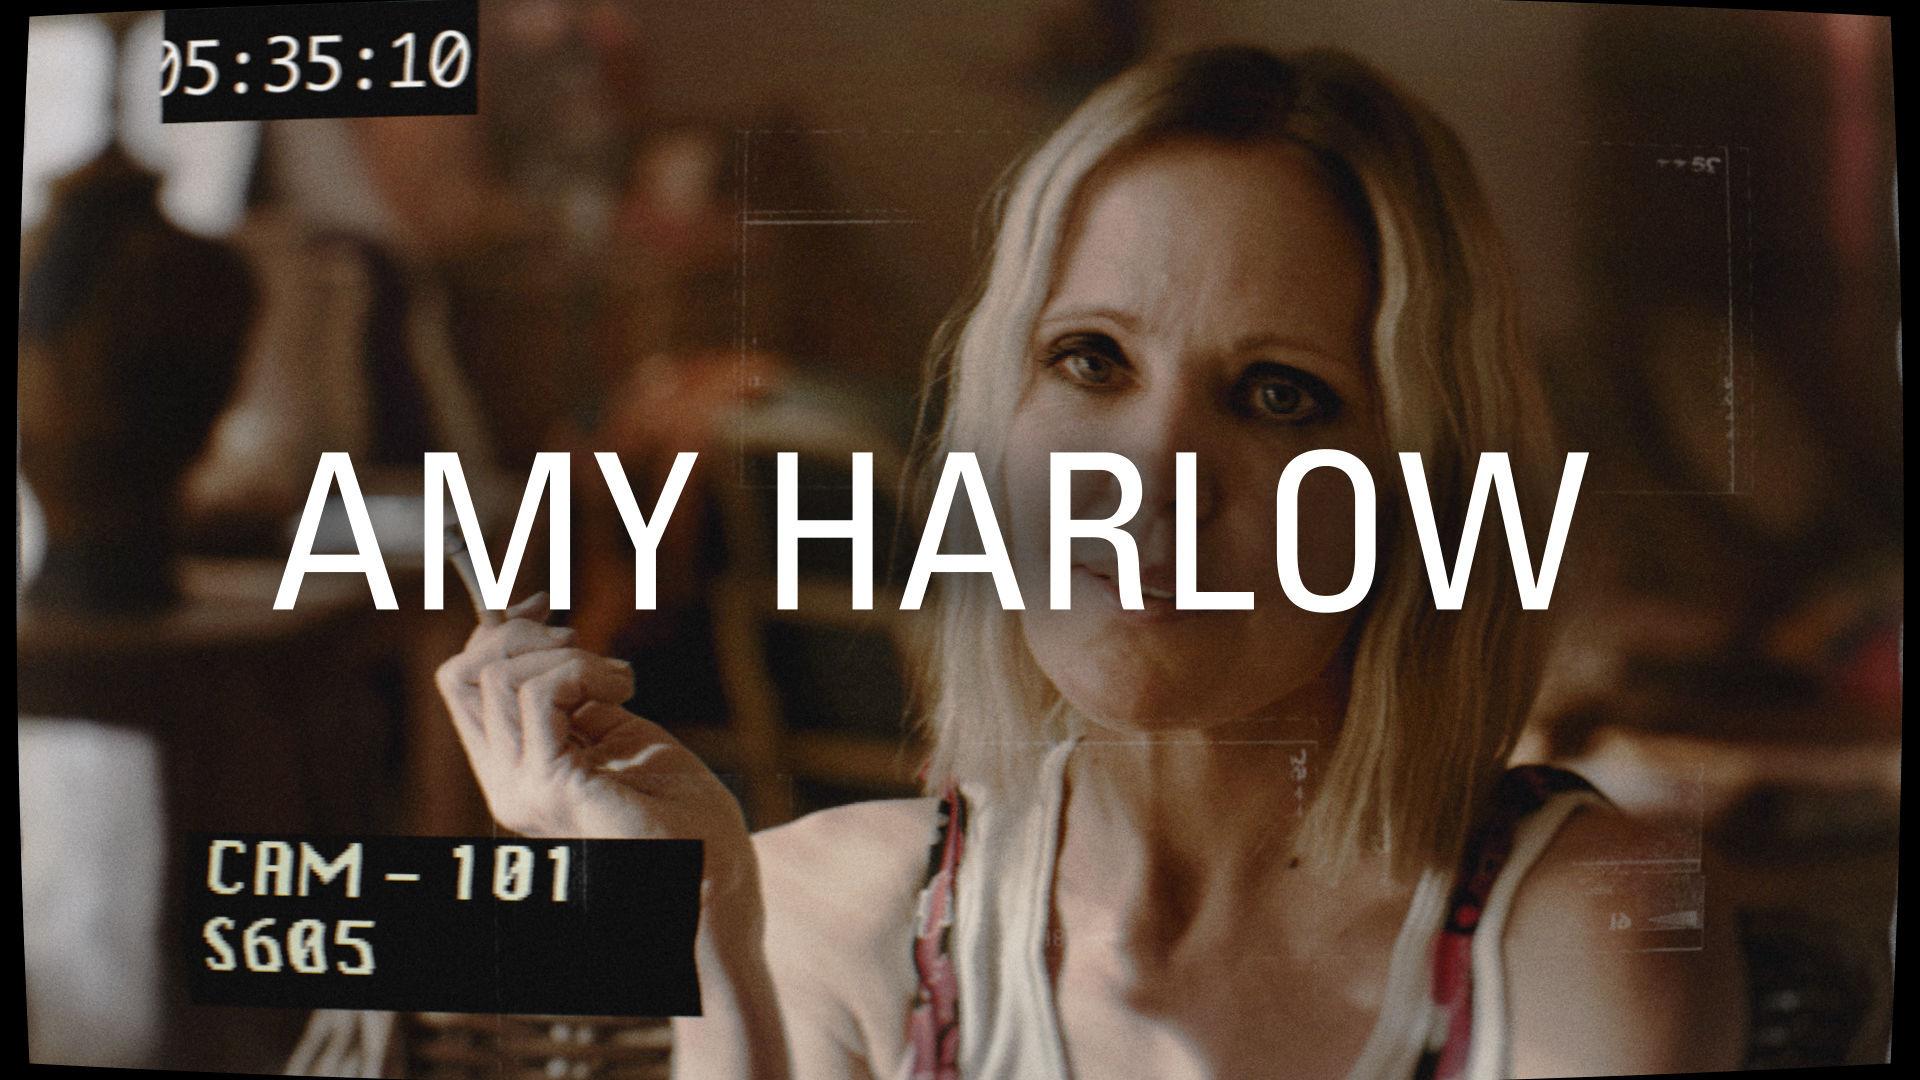 Допрос — s01e09 — P.I. Charlie Shannon vs Amy Harlow 2003